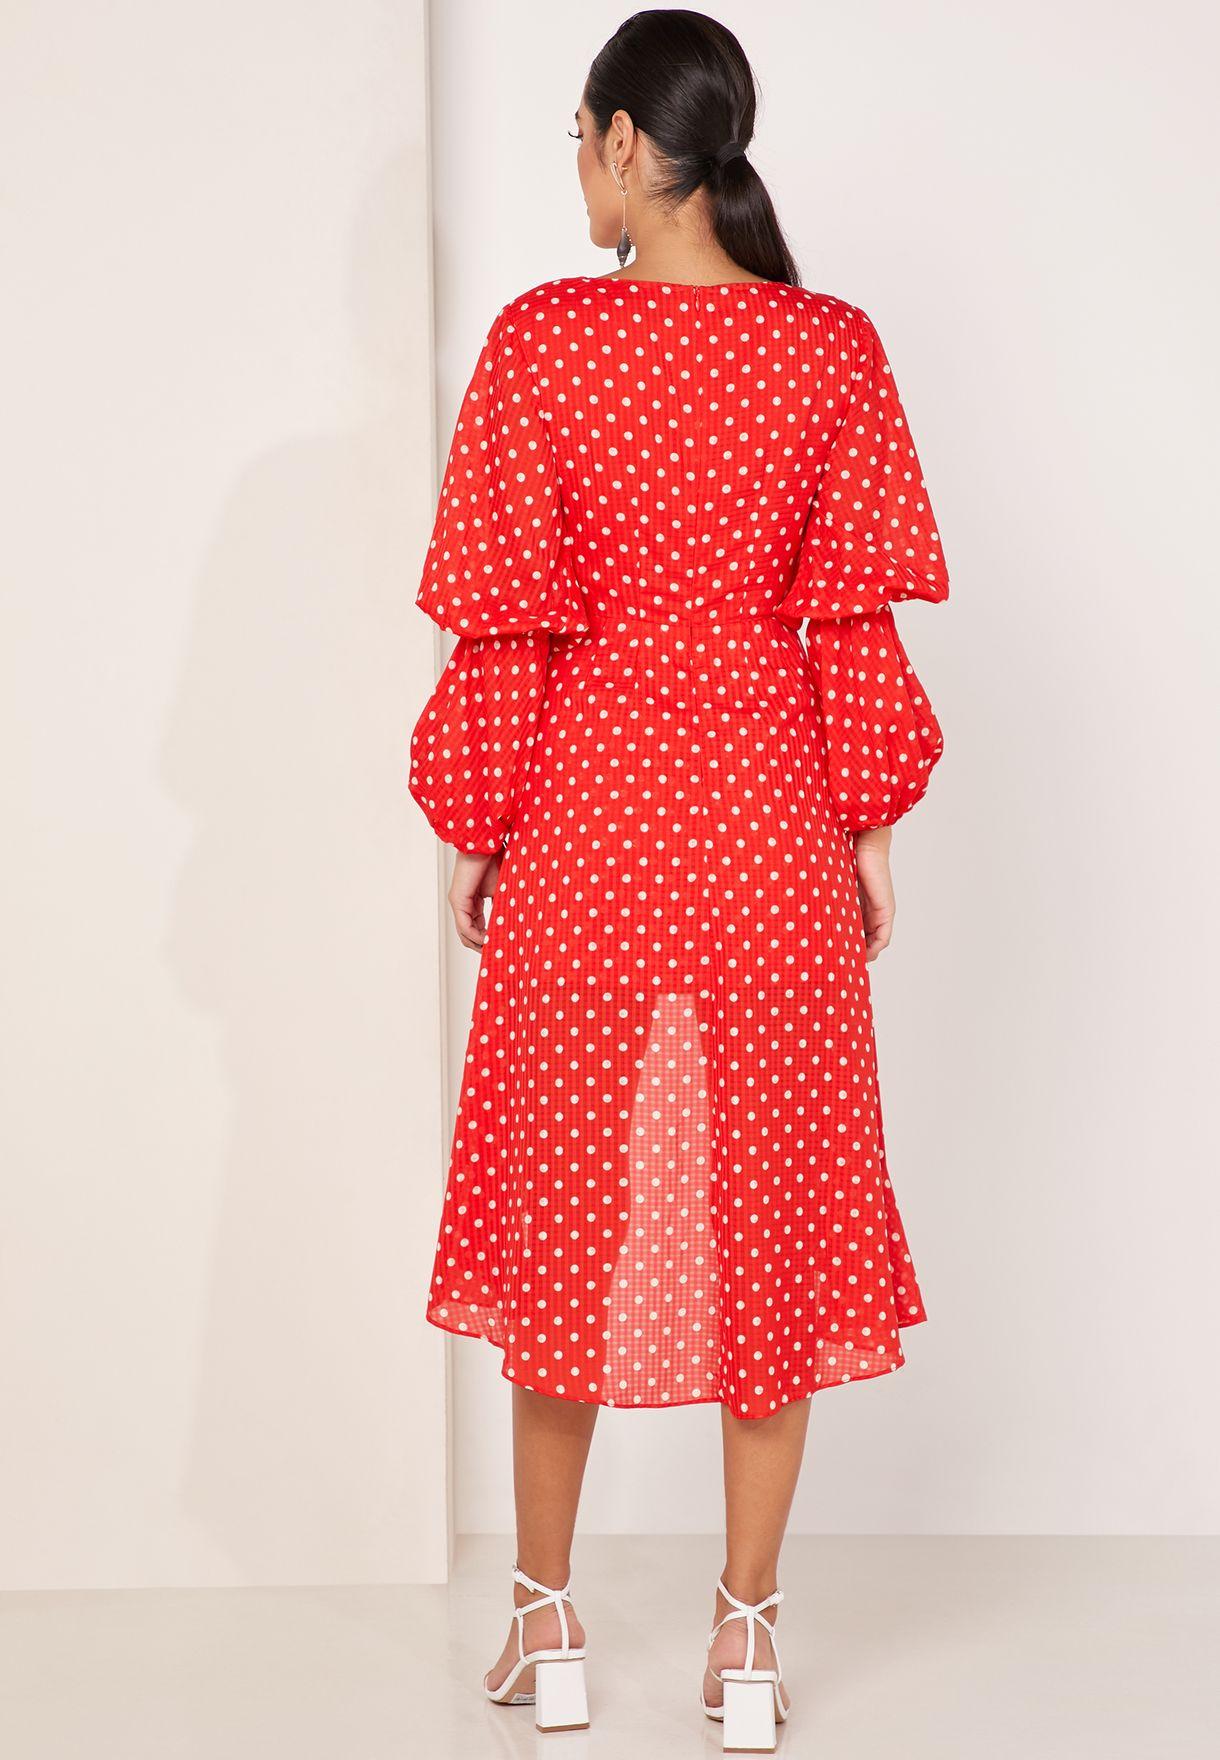 Finders Keepers Rosie Asymmetric Ruffle Dress - Fashion